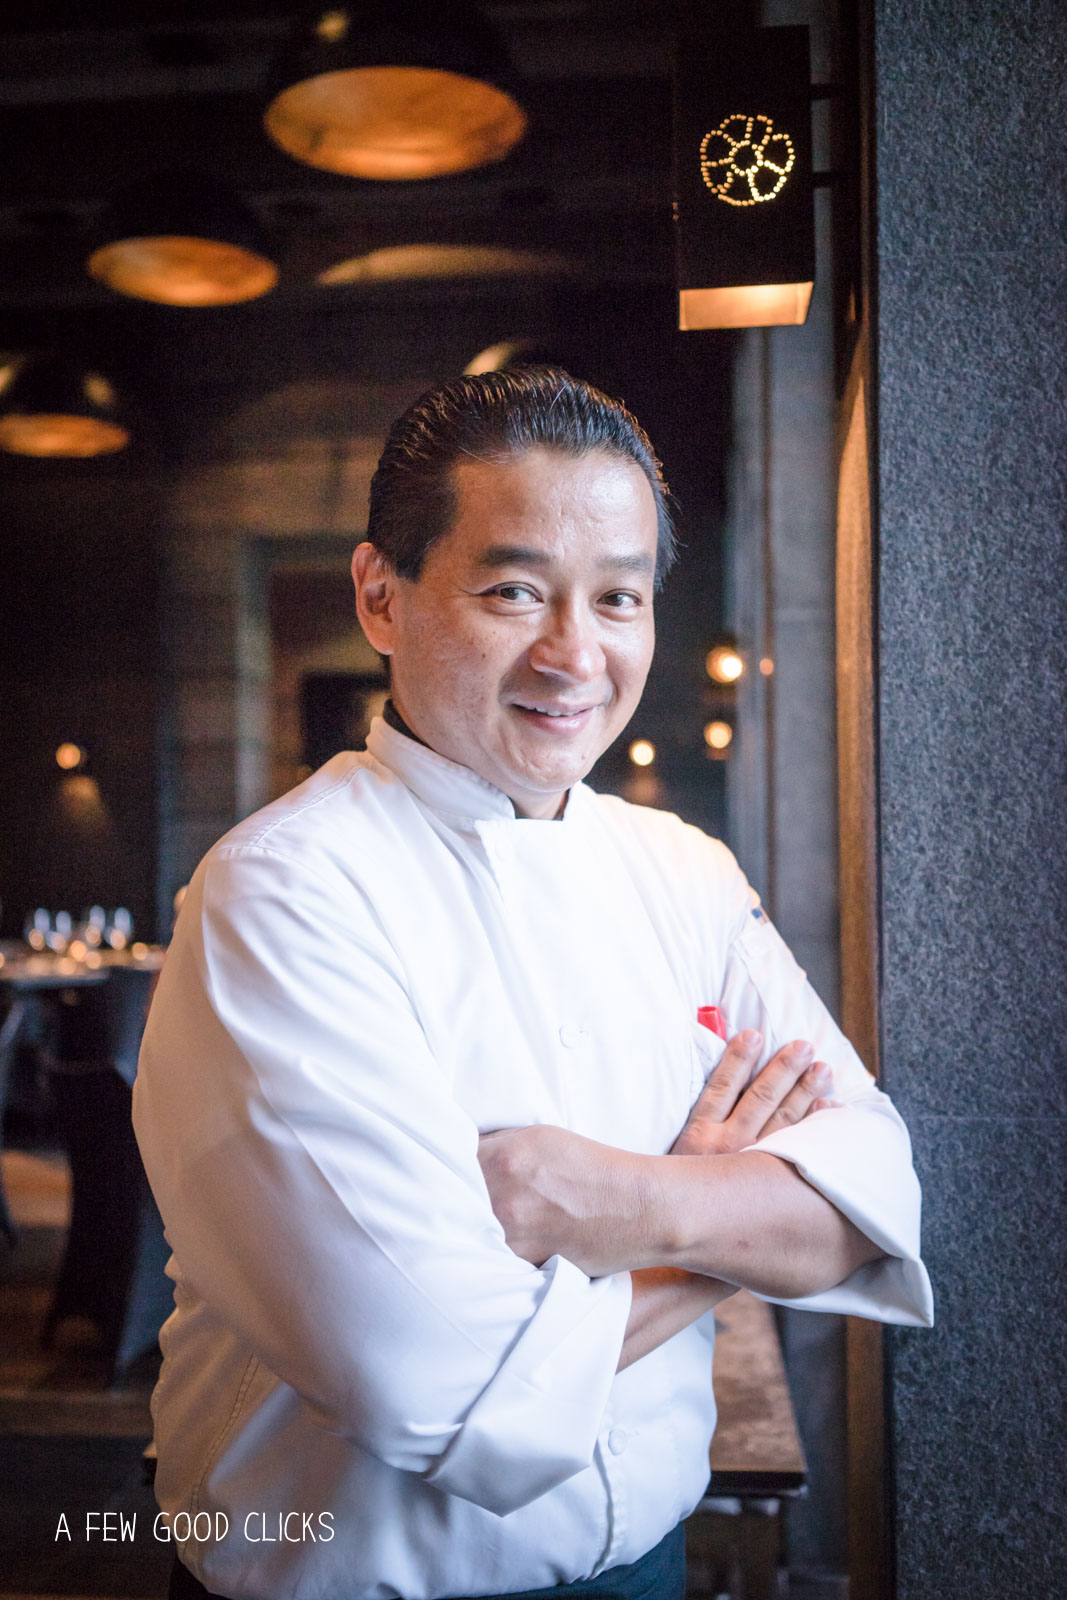 chef-sergio-ichikawa-indochine-restaurant-picture-by-afewgoodclicks